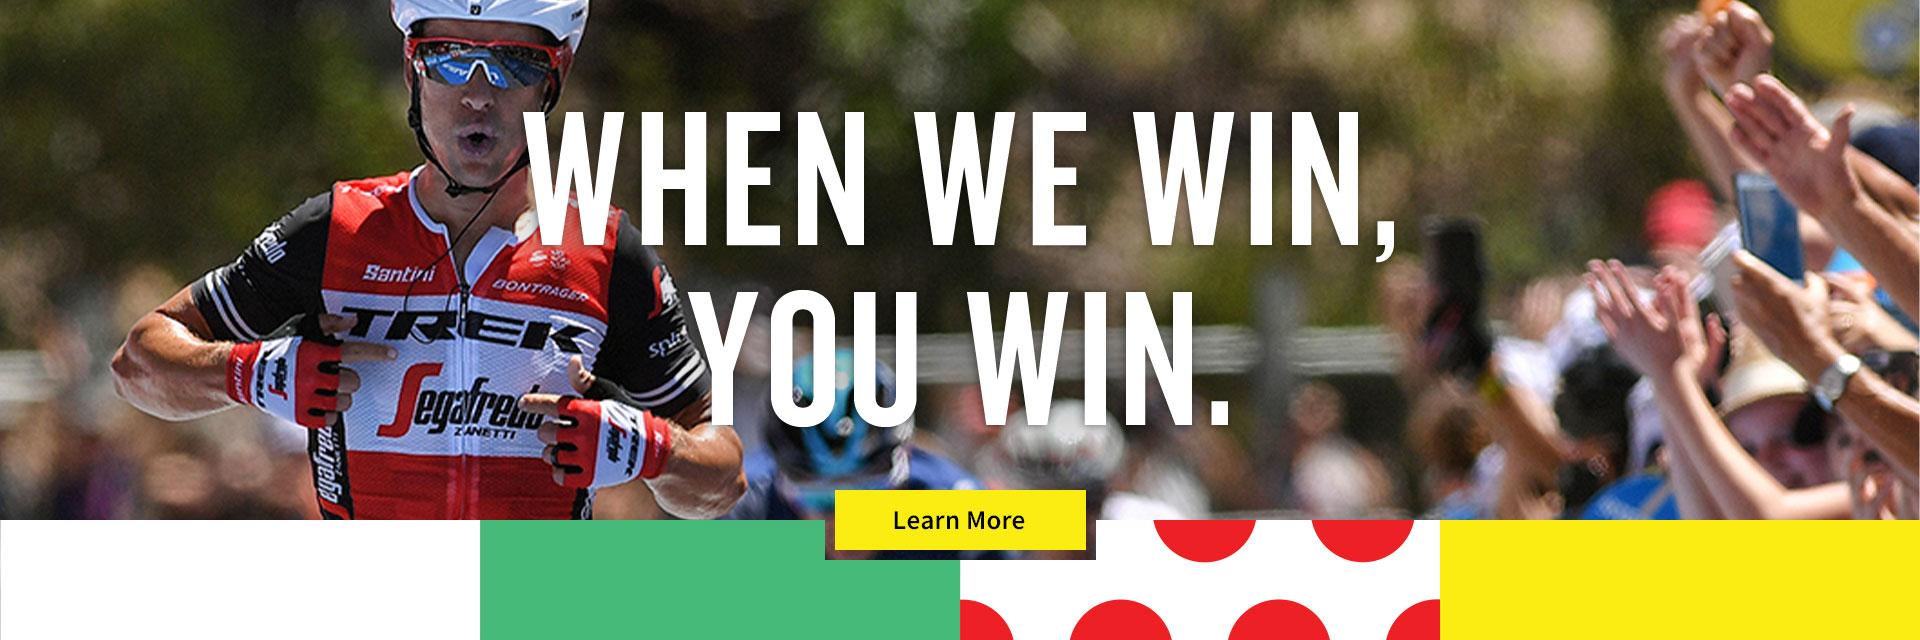 When We Win, You Win!